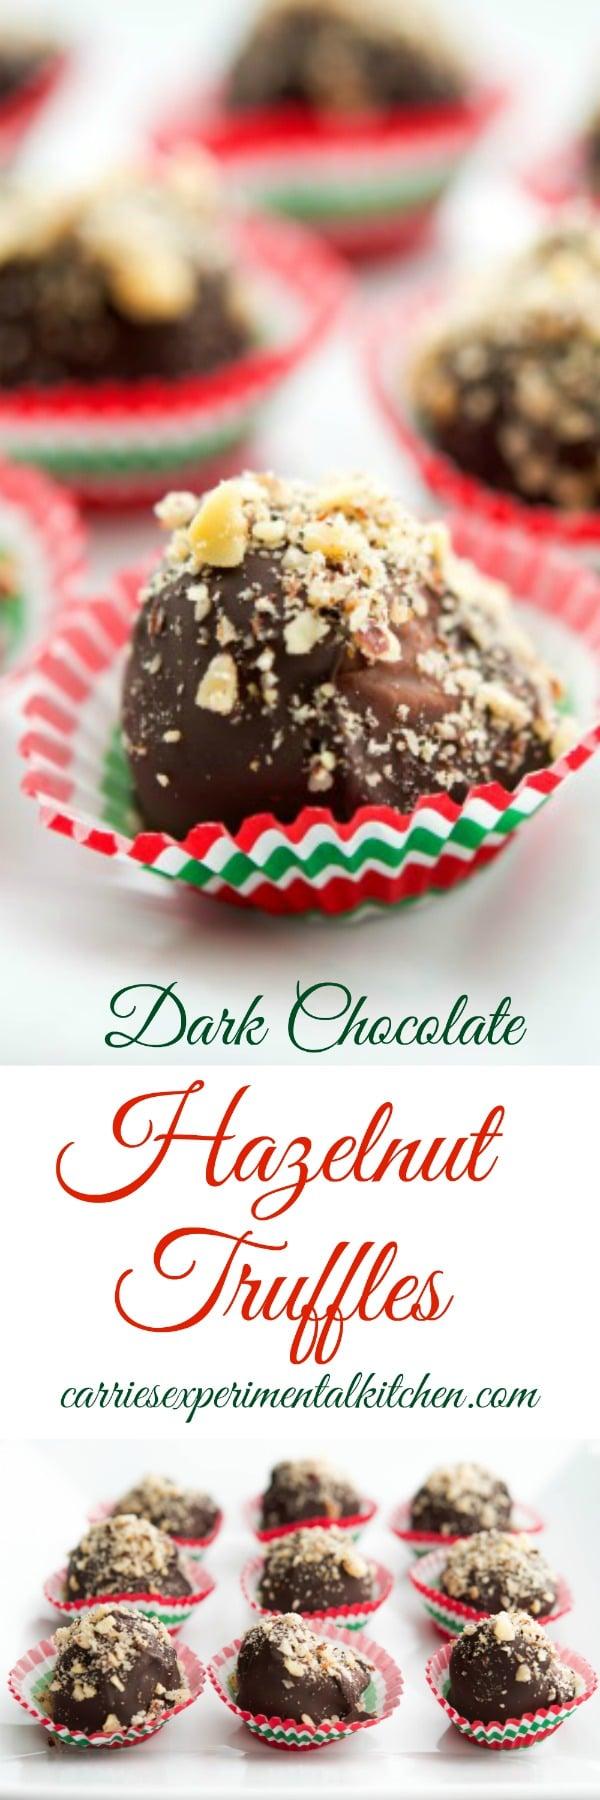 Creamy chocolate hazelnut spread mixed with chopped hazelnuts; then dipped in melted dark chocolate and topped with more chopped hazelnuts. #dessert #hazelnut #truffles #holidaybaking